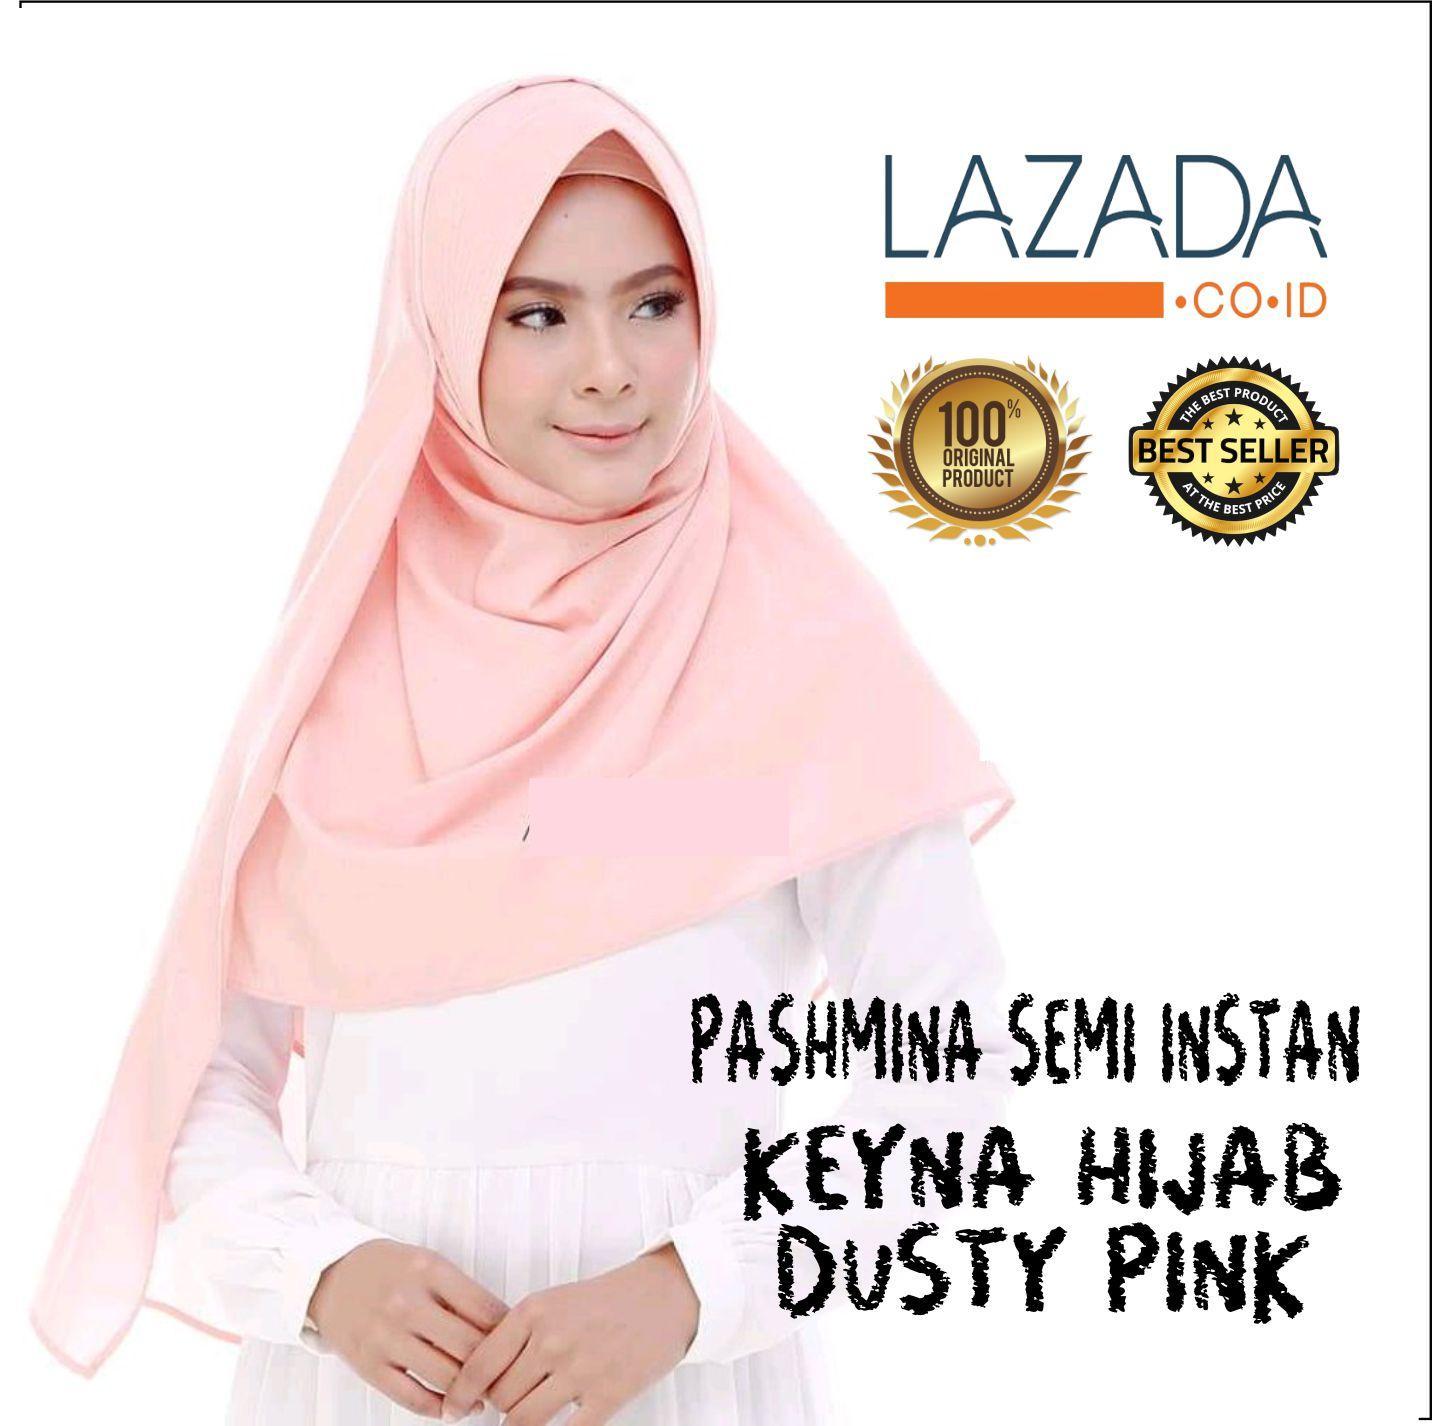 Montaza Hijab Jilbab Instan Ungu Kerudung Geblus Pashmina Hdn868 Source · Montaza Hijab Premium Katun Jilbab